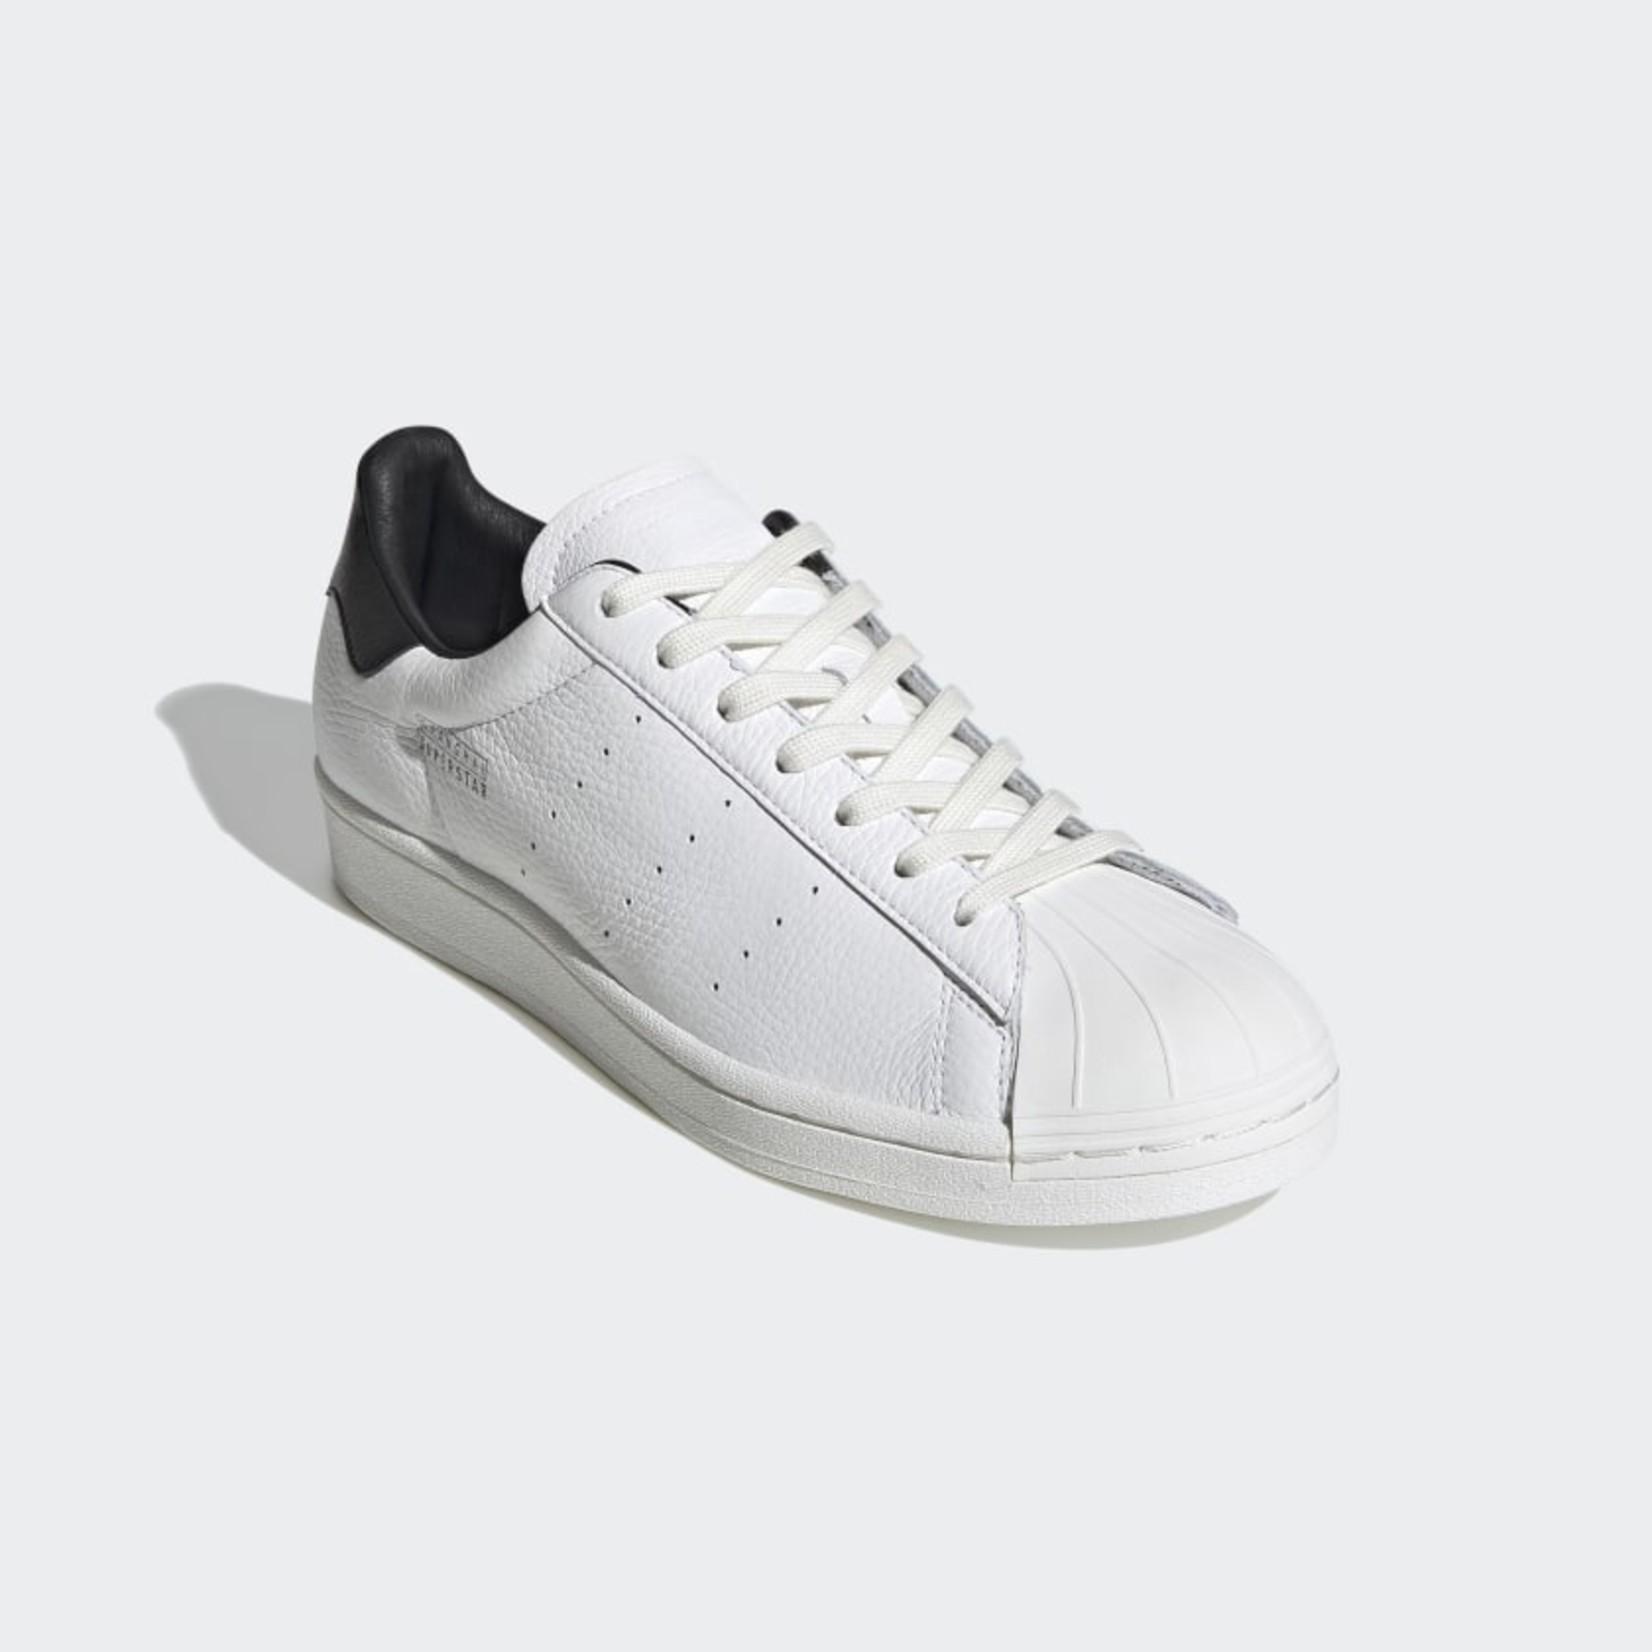 Adidas Superstar Pure Ftwwht/Cblack/Owhite